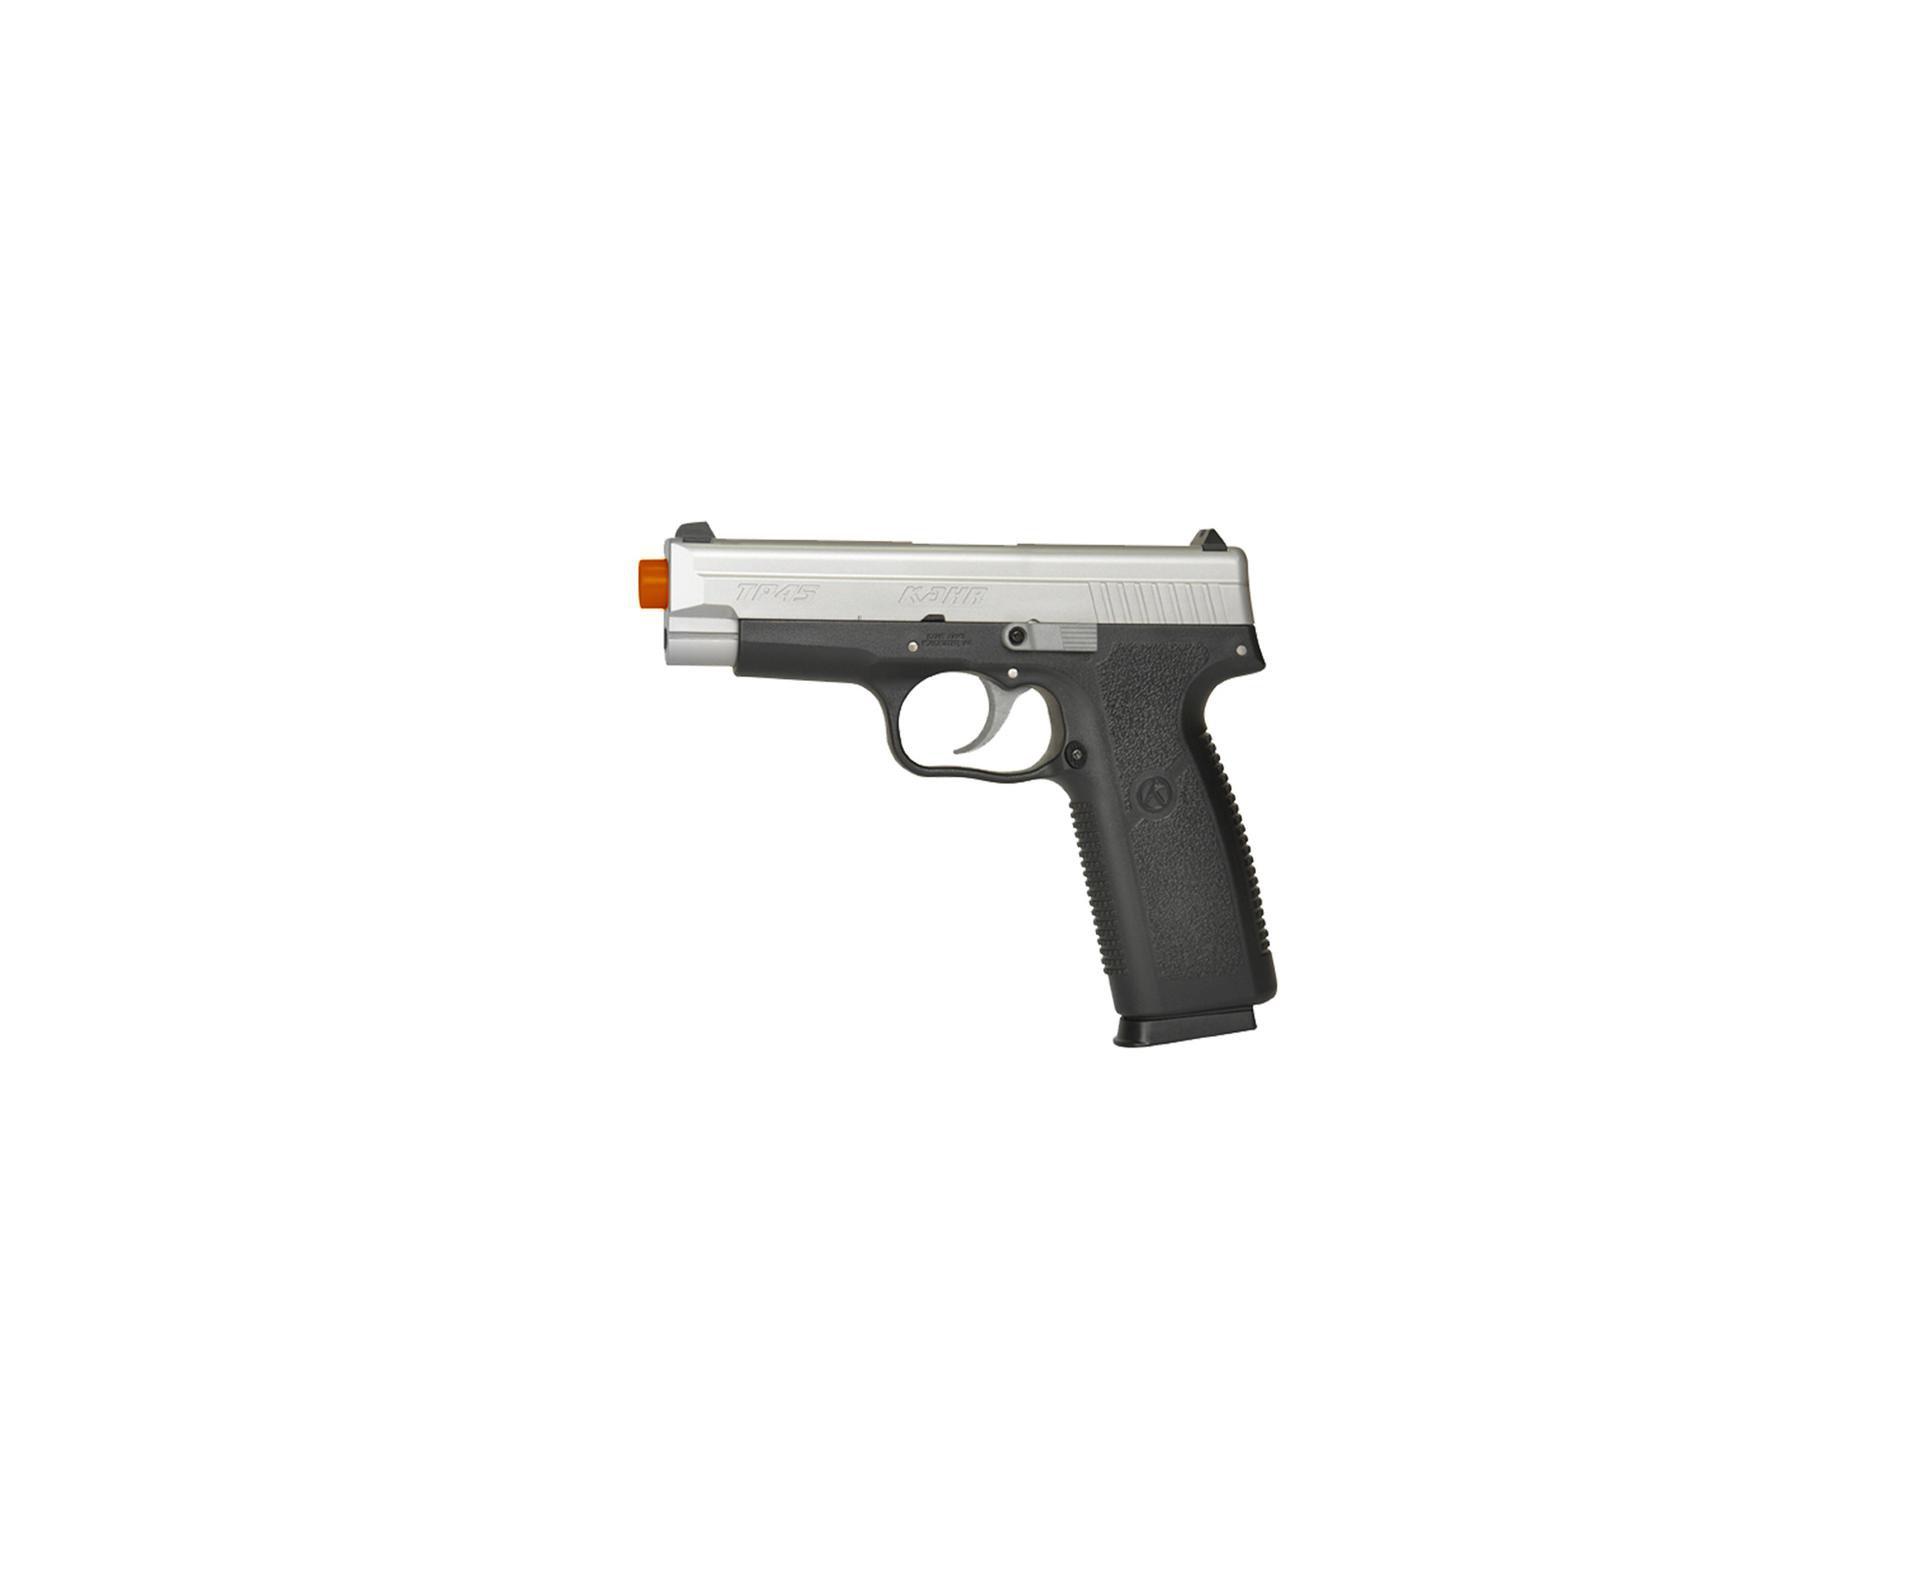 Pistola De Airsoft Tp45 - Kahr Arms - Calibre 6.0 Mm  - Cyber Gun